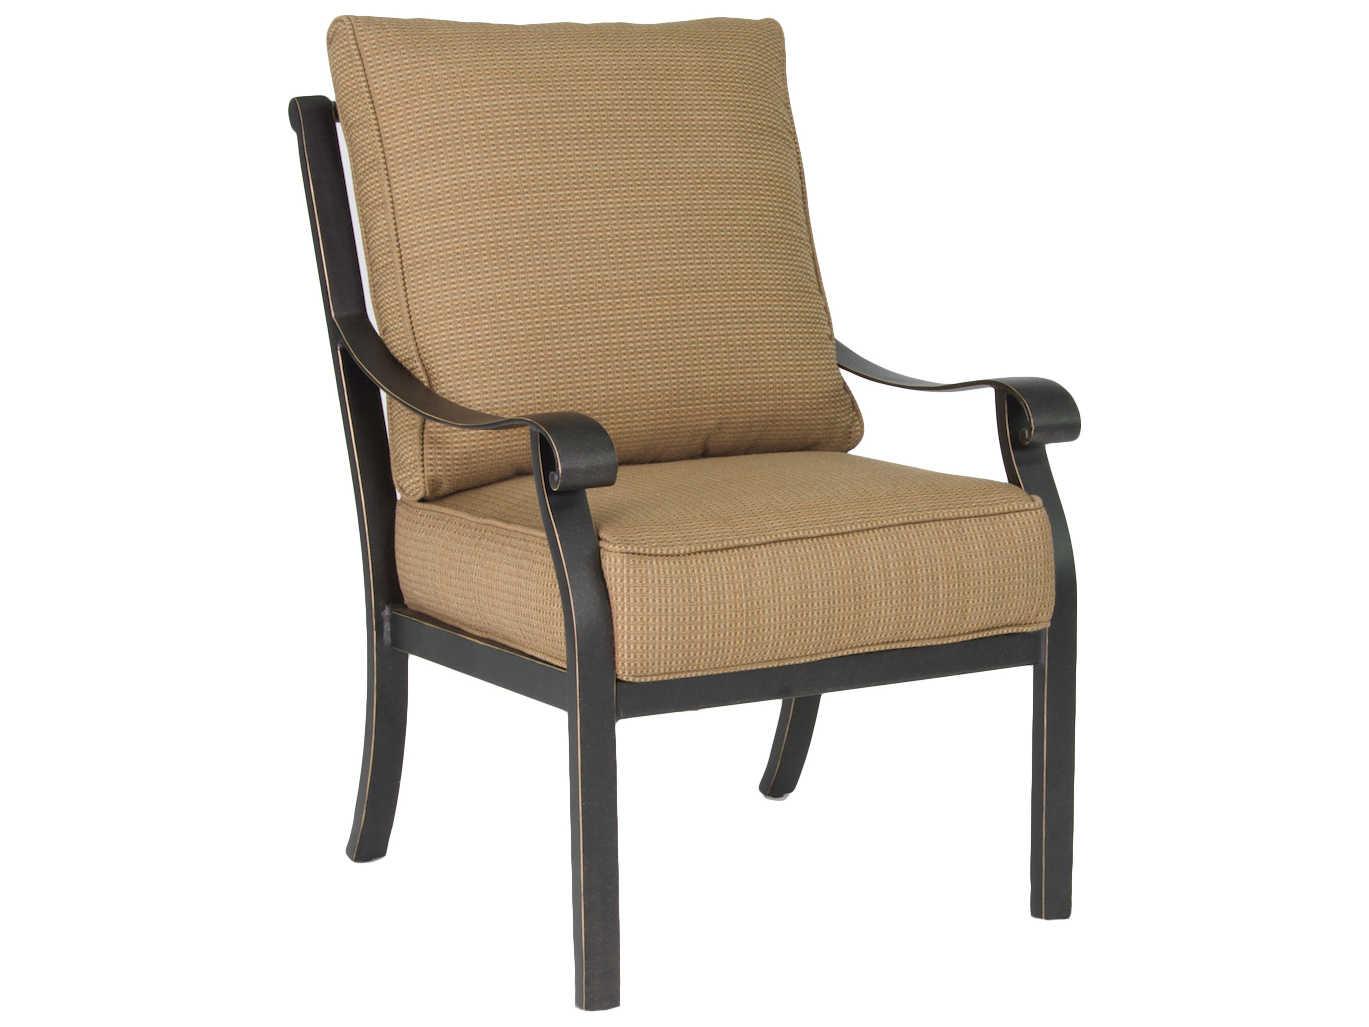 Castelle Madrid Cushion Cast Aluminum Dining Chair